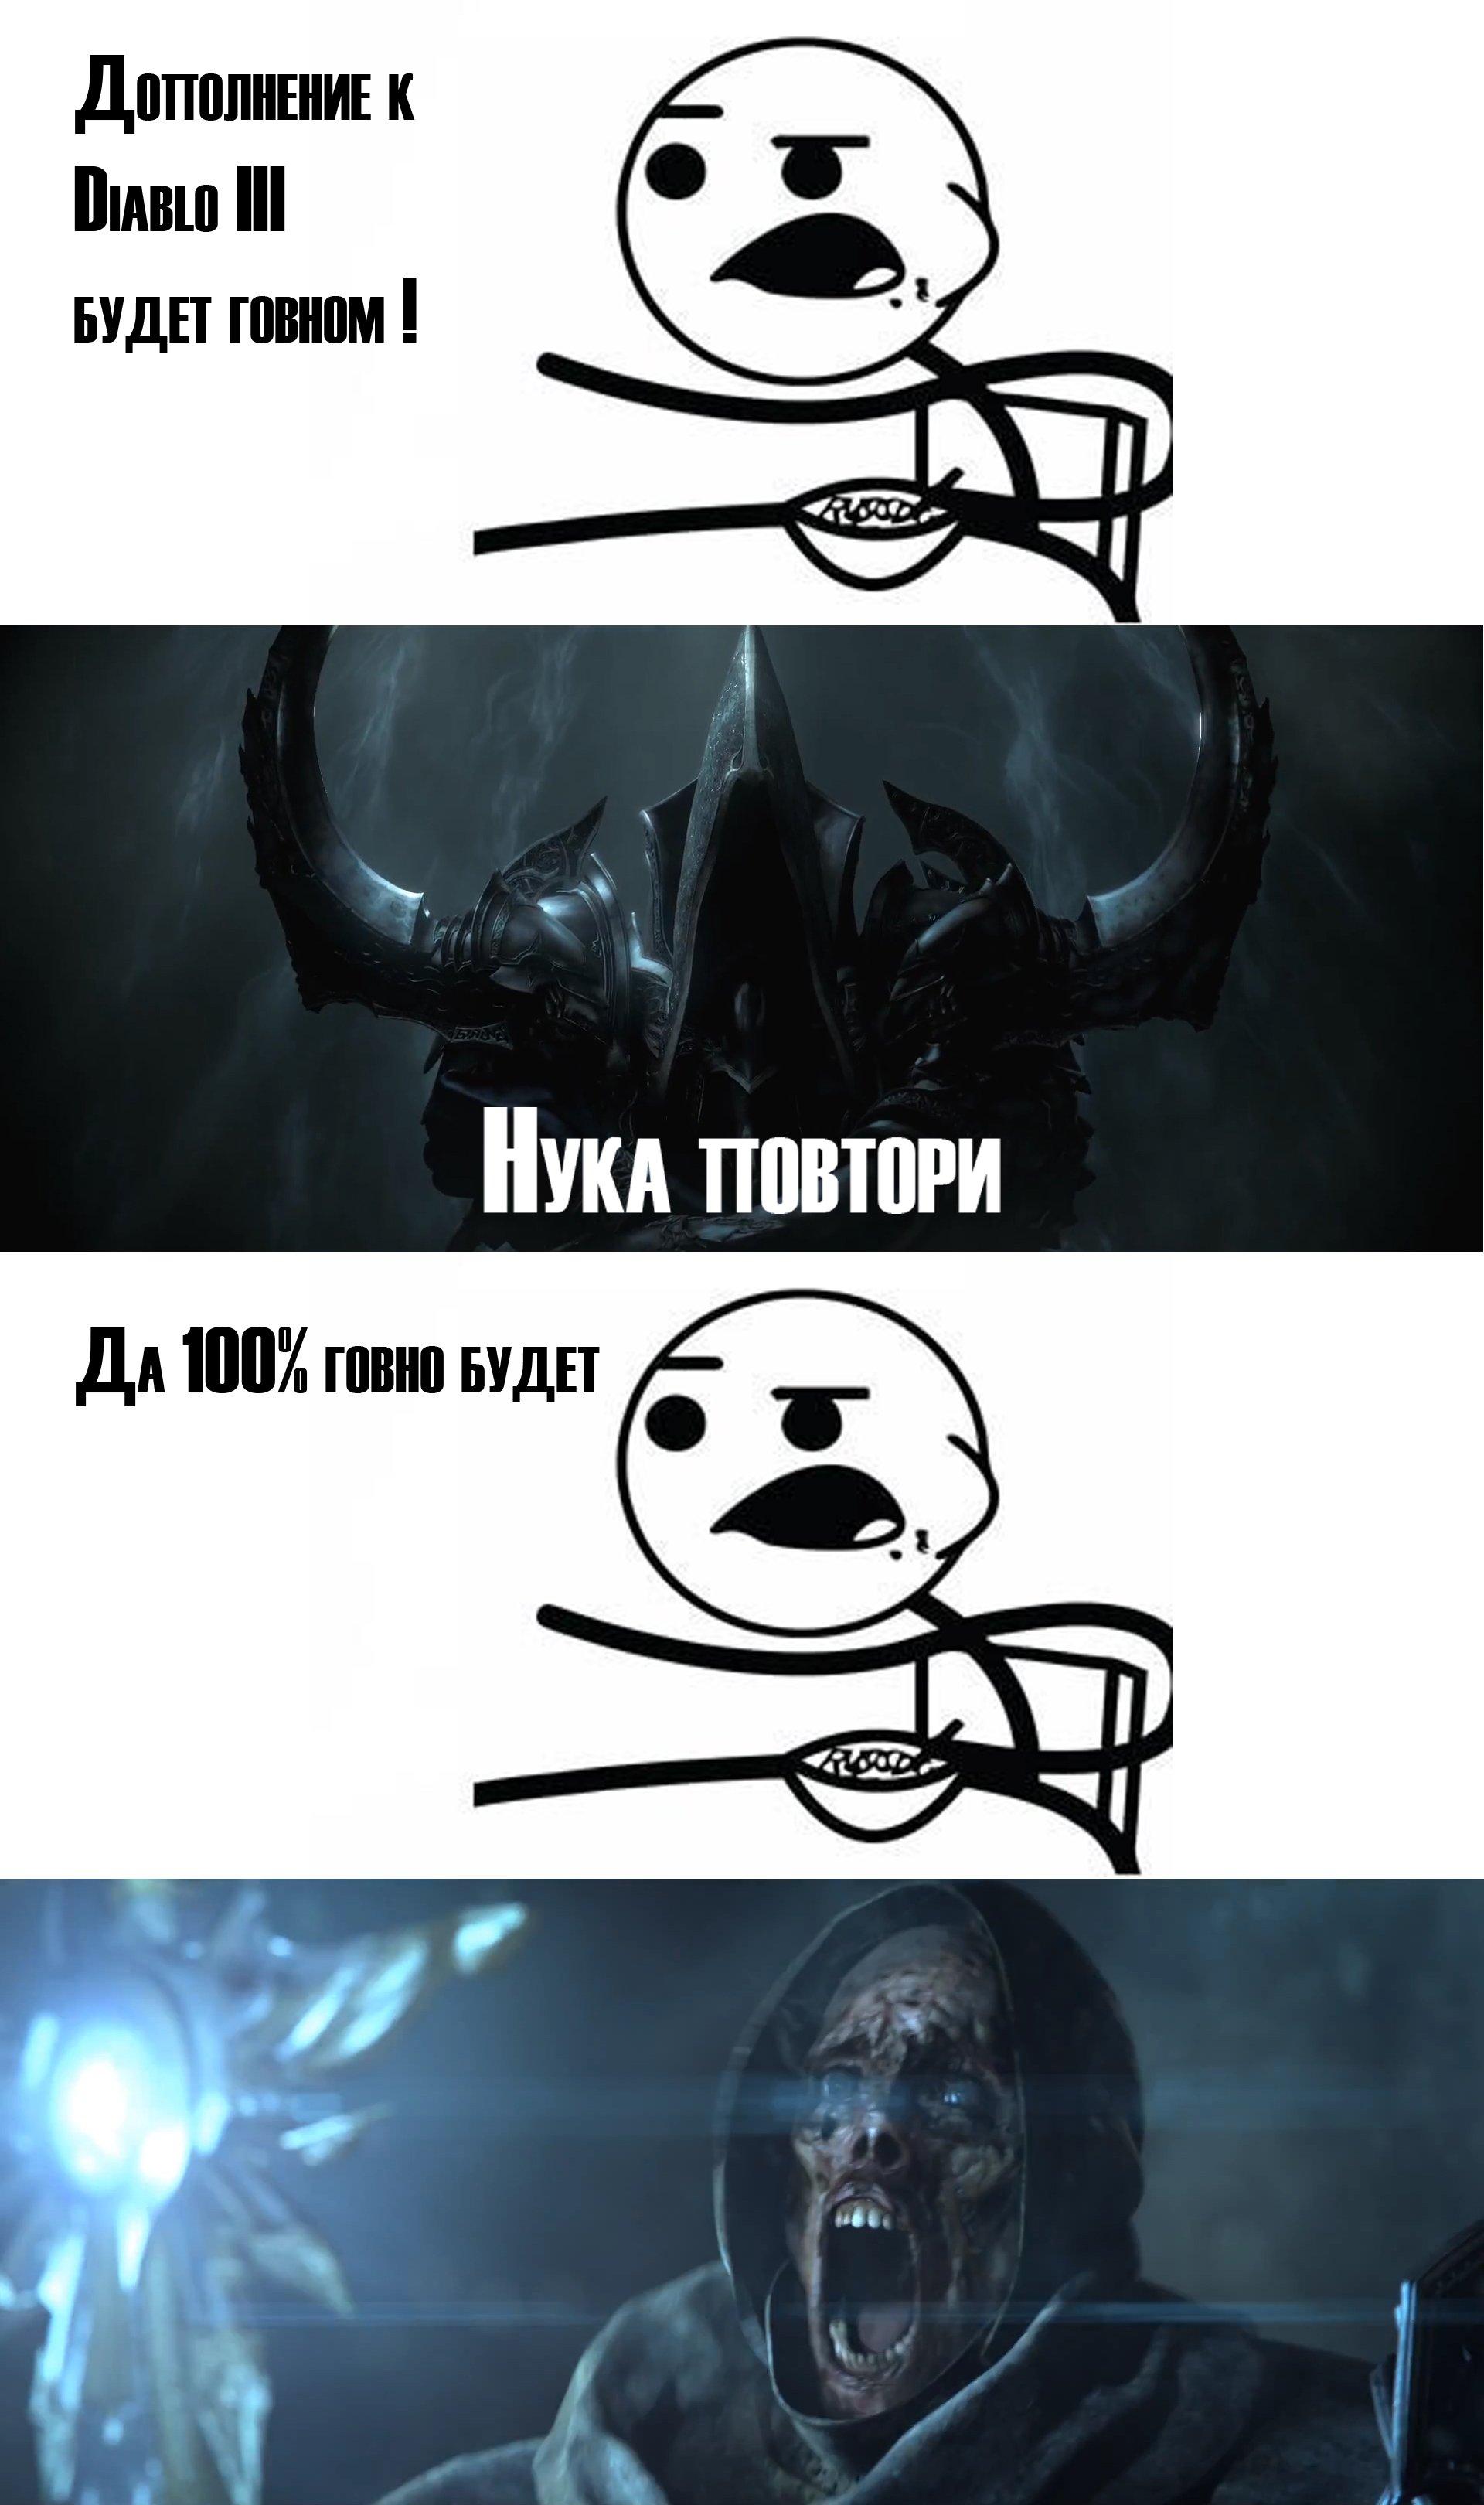 #DiabloIII_Reaper_of_Souls - Изображение 1